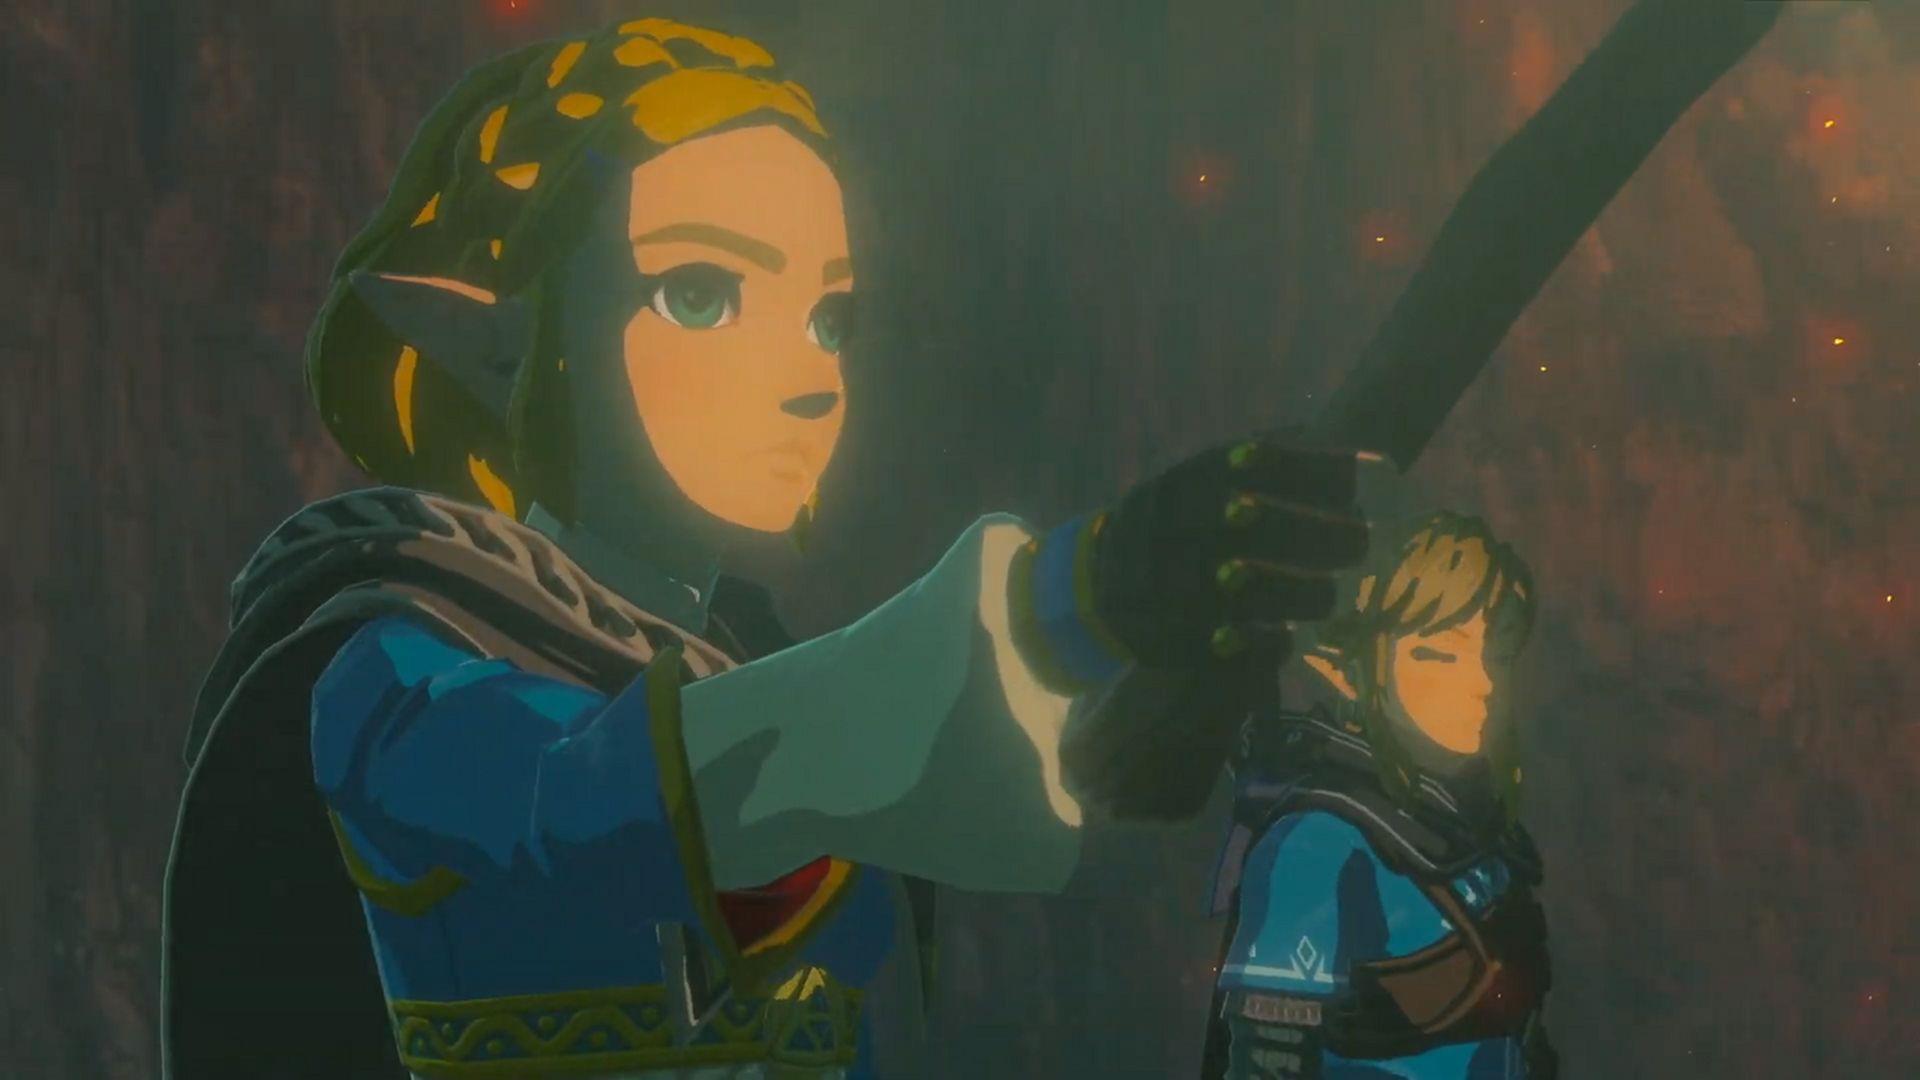 La secuela de The Legend of Zelda Breath of the Wild